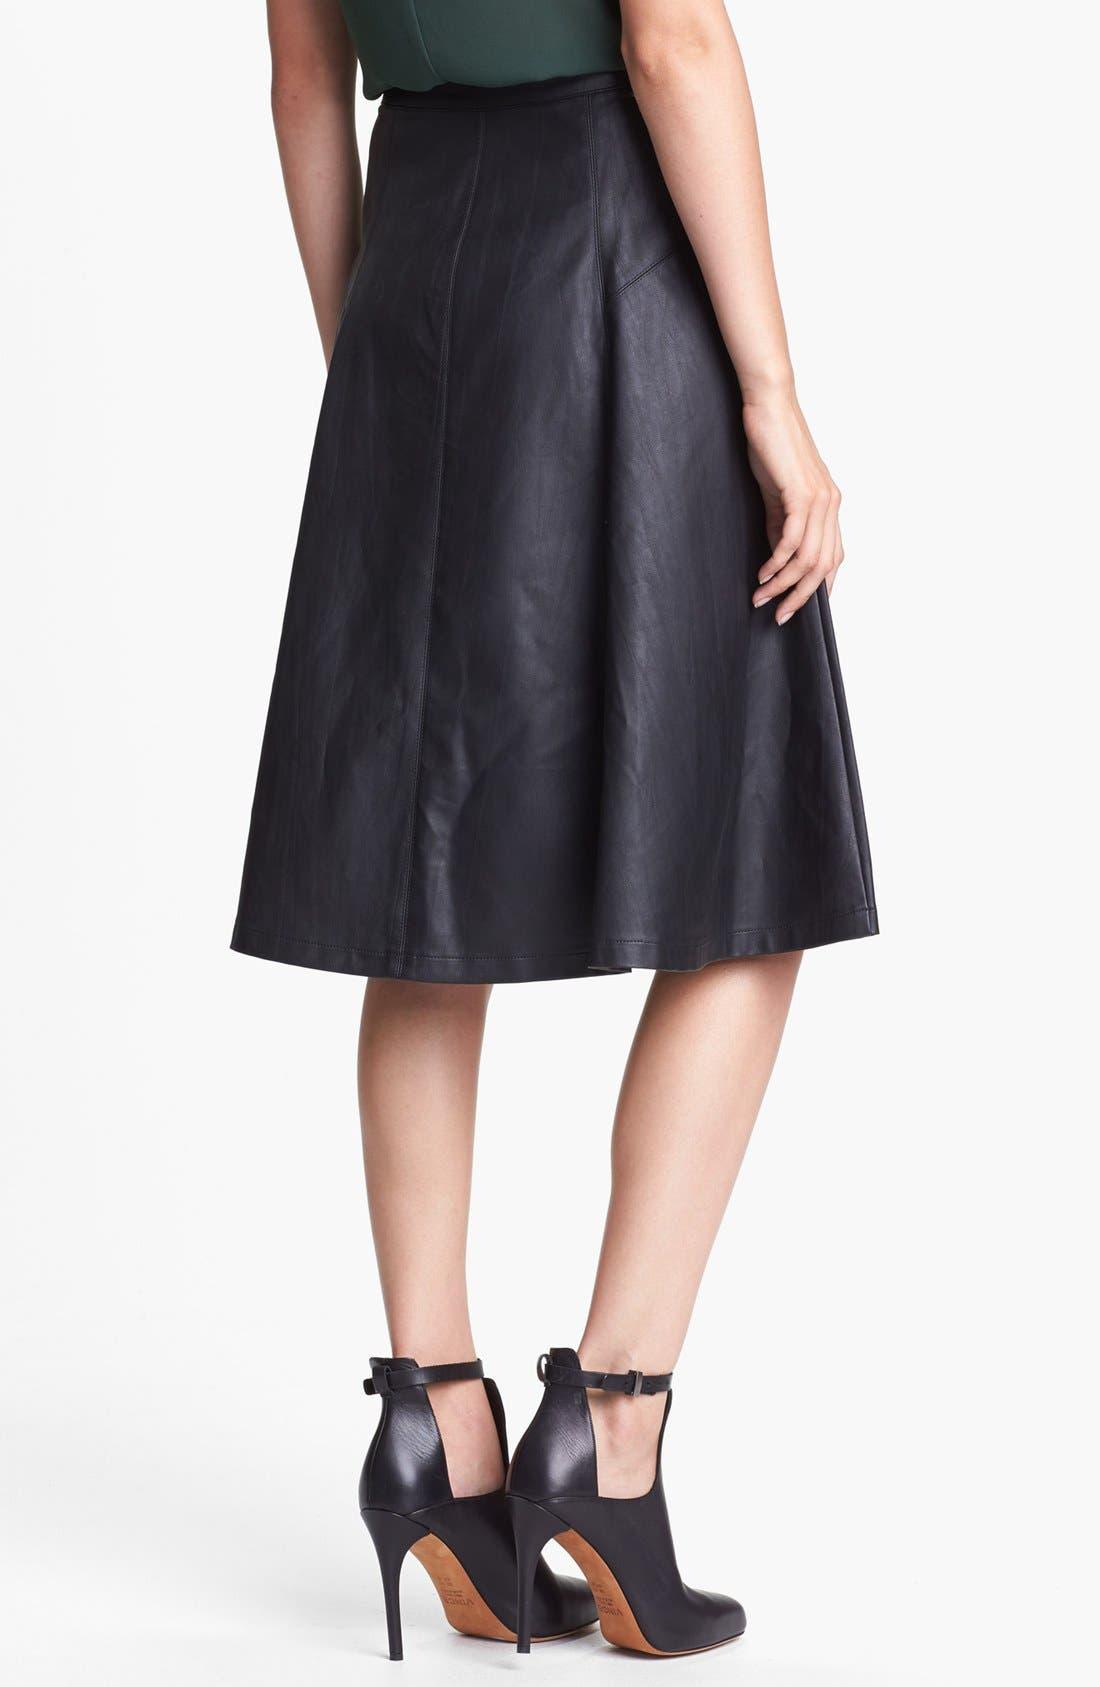 ASTR THE LABEL, ASTR Faux Leather Midi Skirt, Alternate thumbnail 3, color, 001